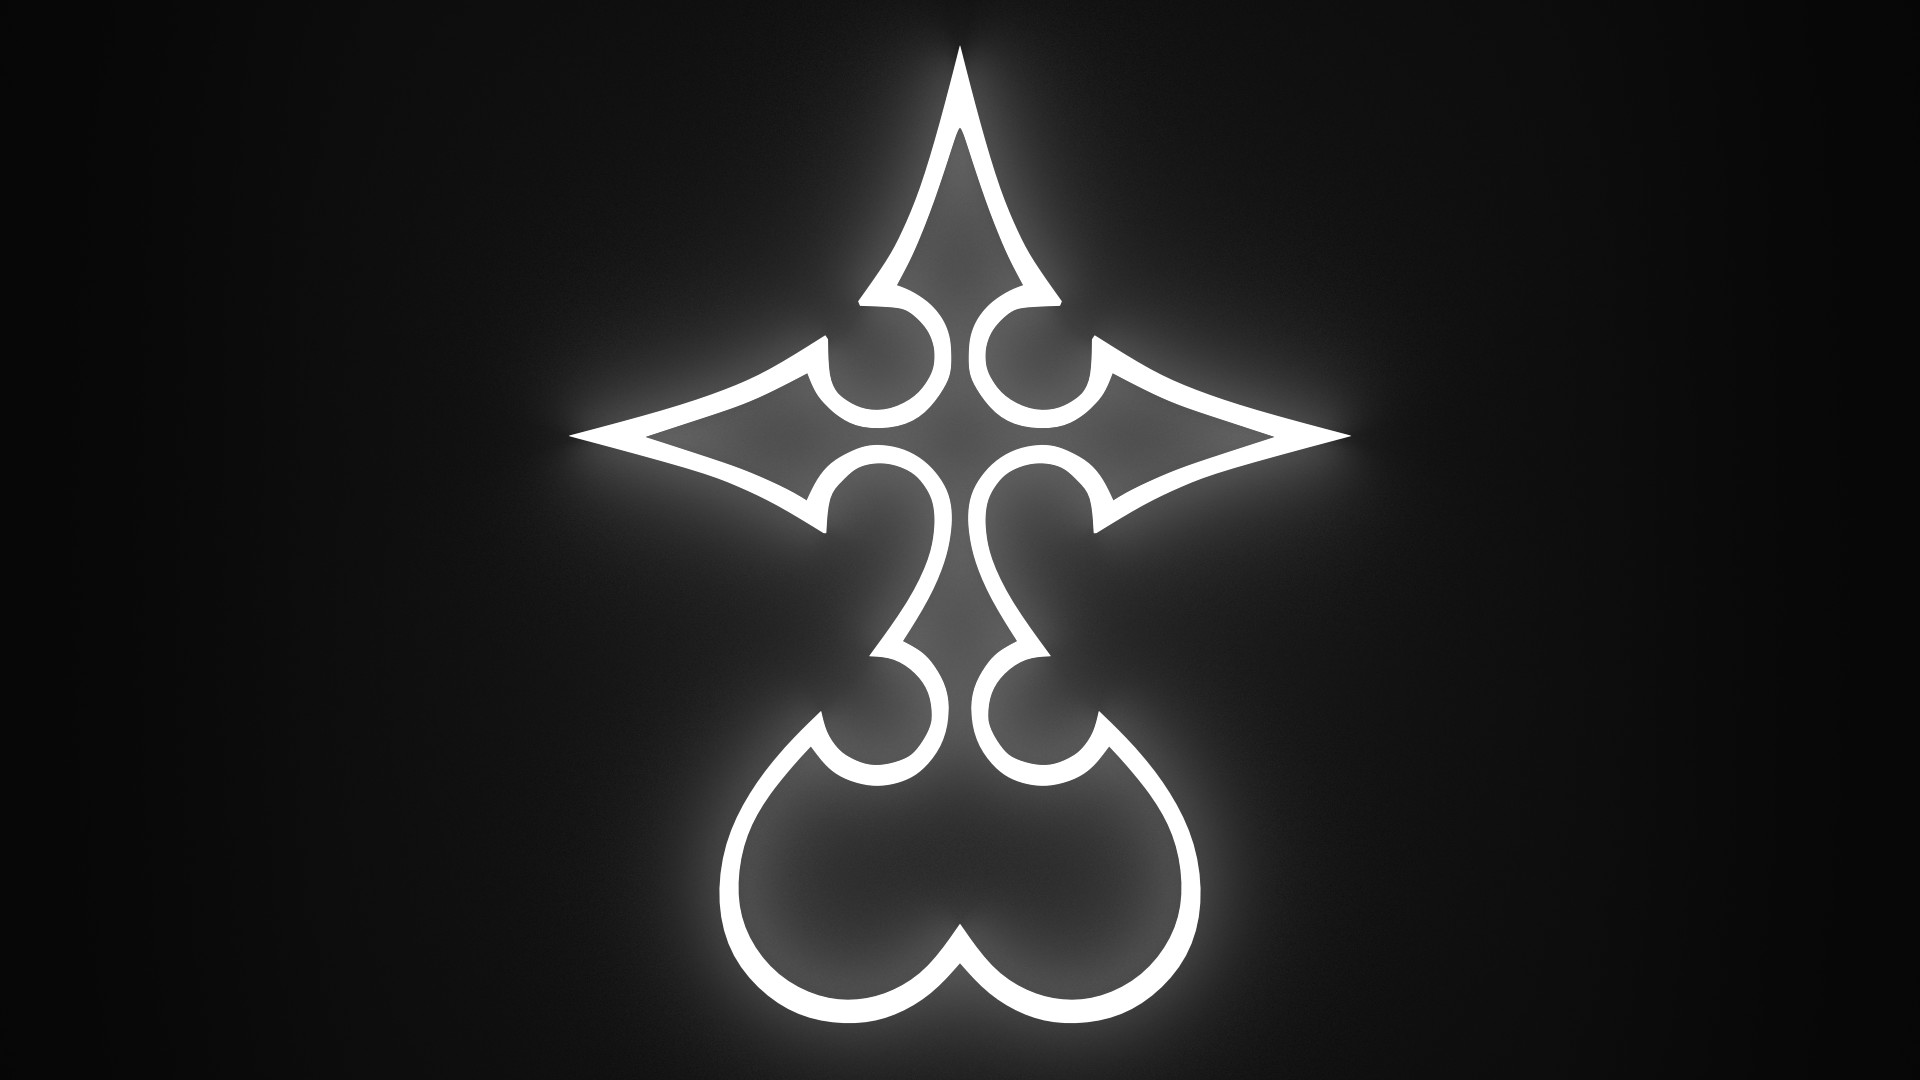 Kingdom Hearts – Nobody Wallpaper by abluescarab Kingdom Hearts – Nobody  Wallpaper by abluescarab